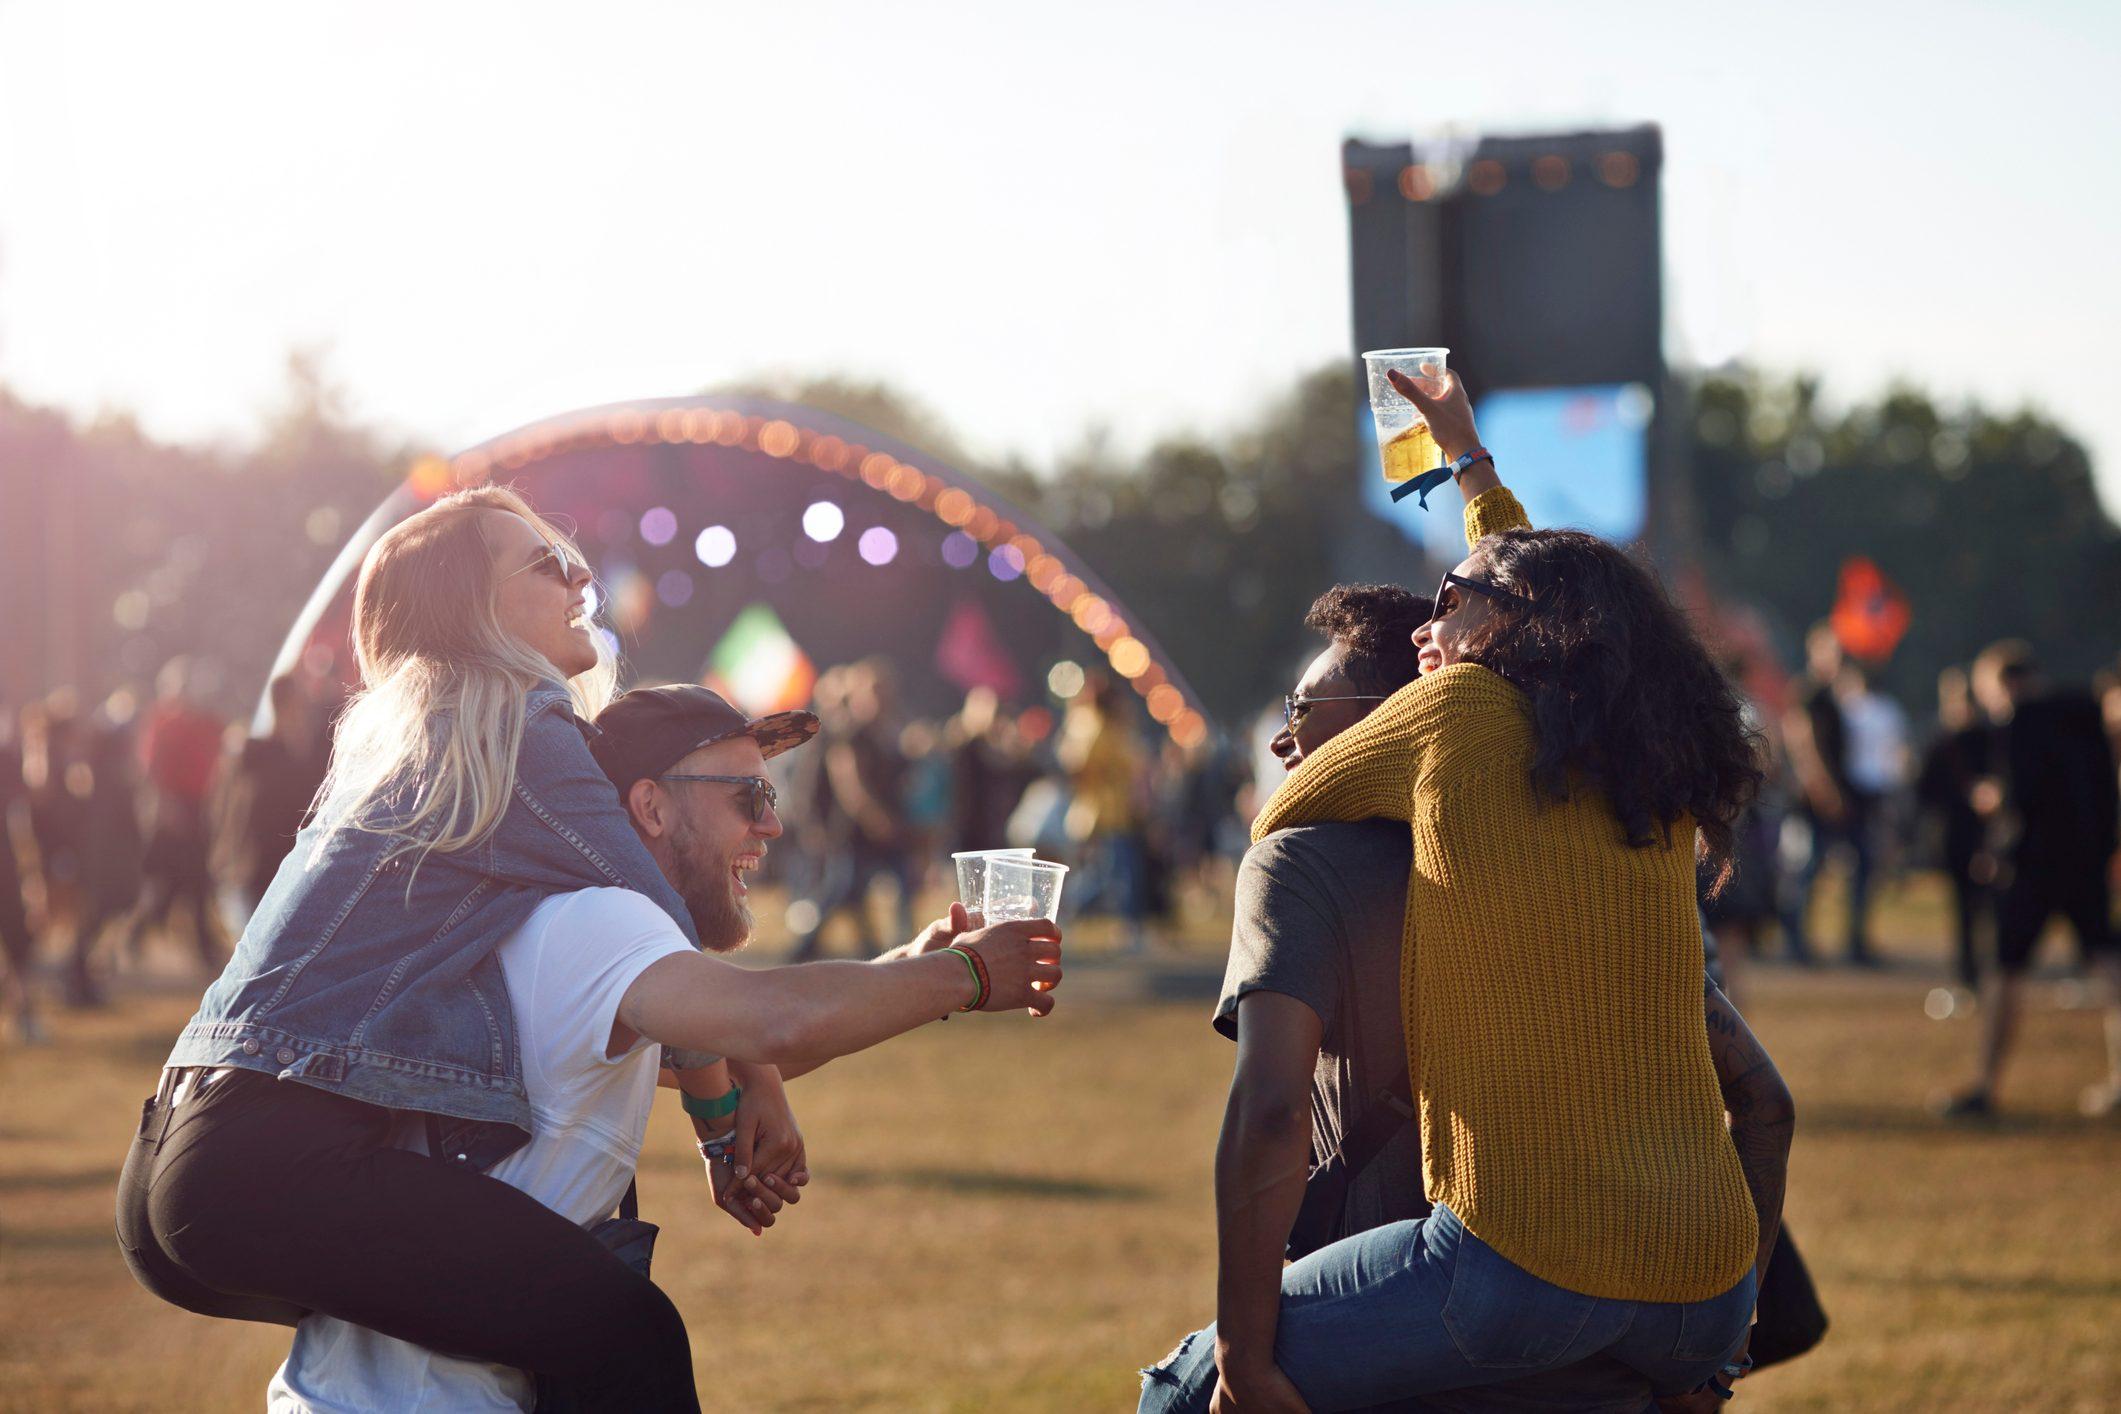 friends at music festival convert